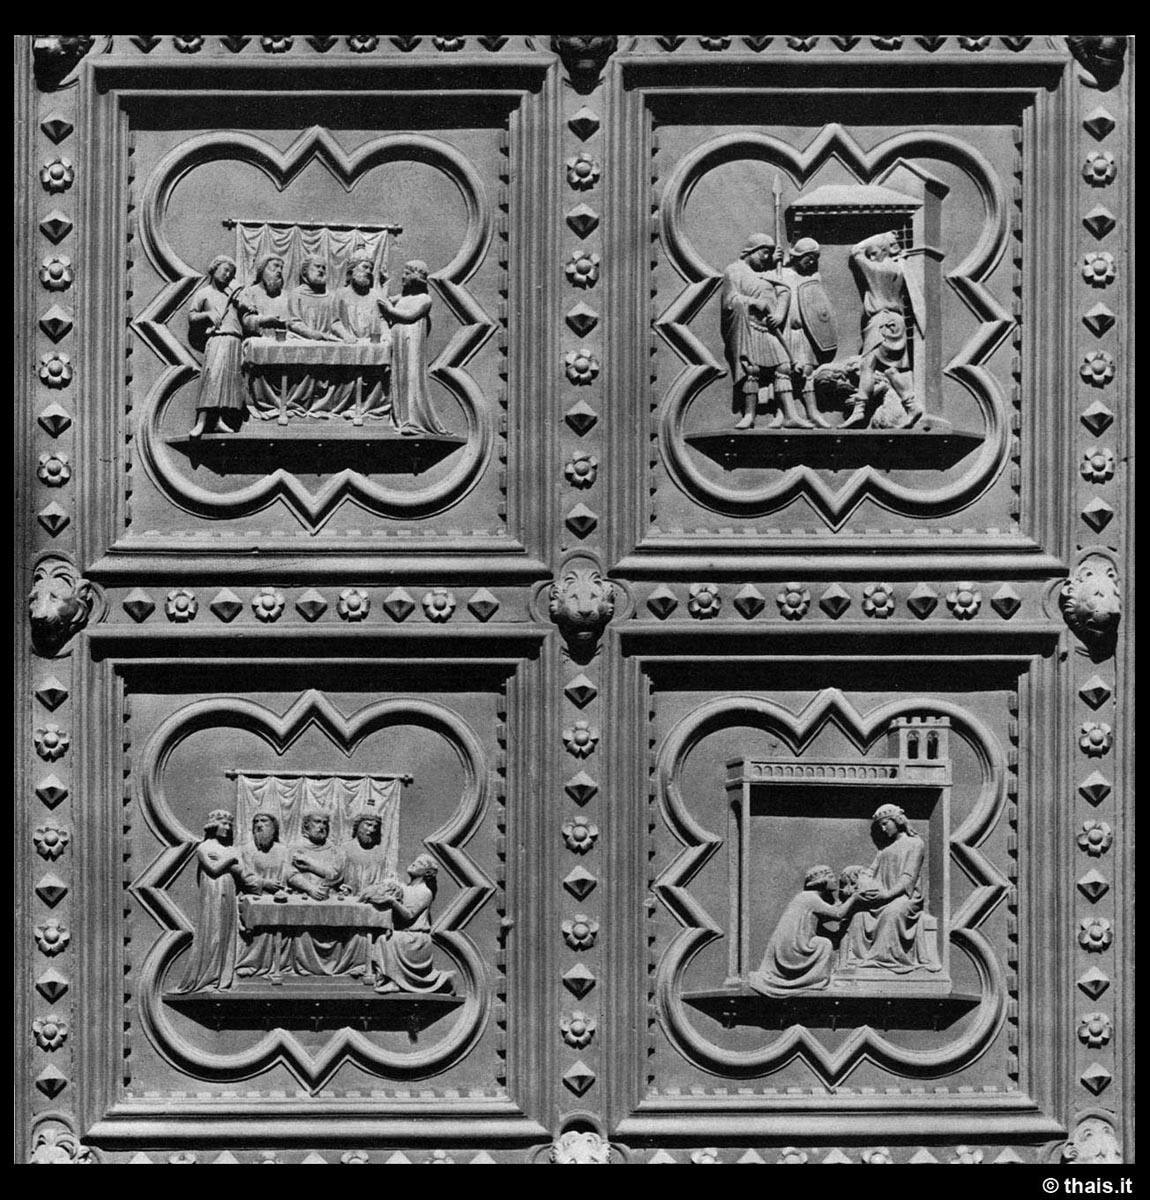 Andrea Pisano South door (detail). Photo: Thais.it